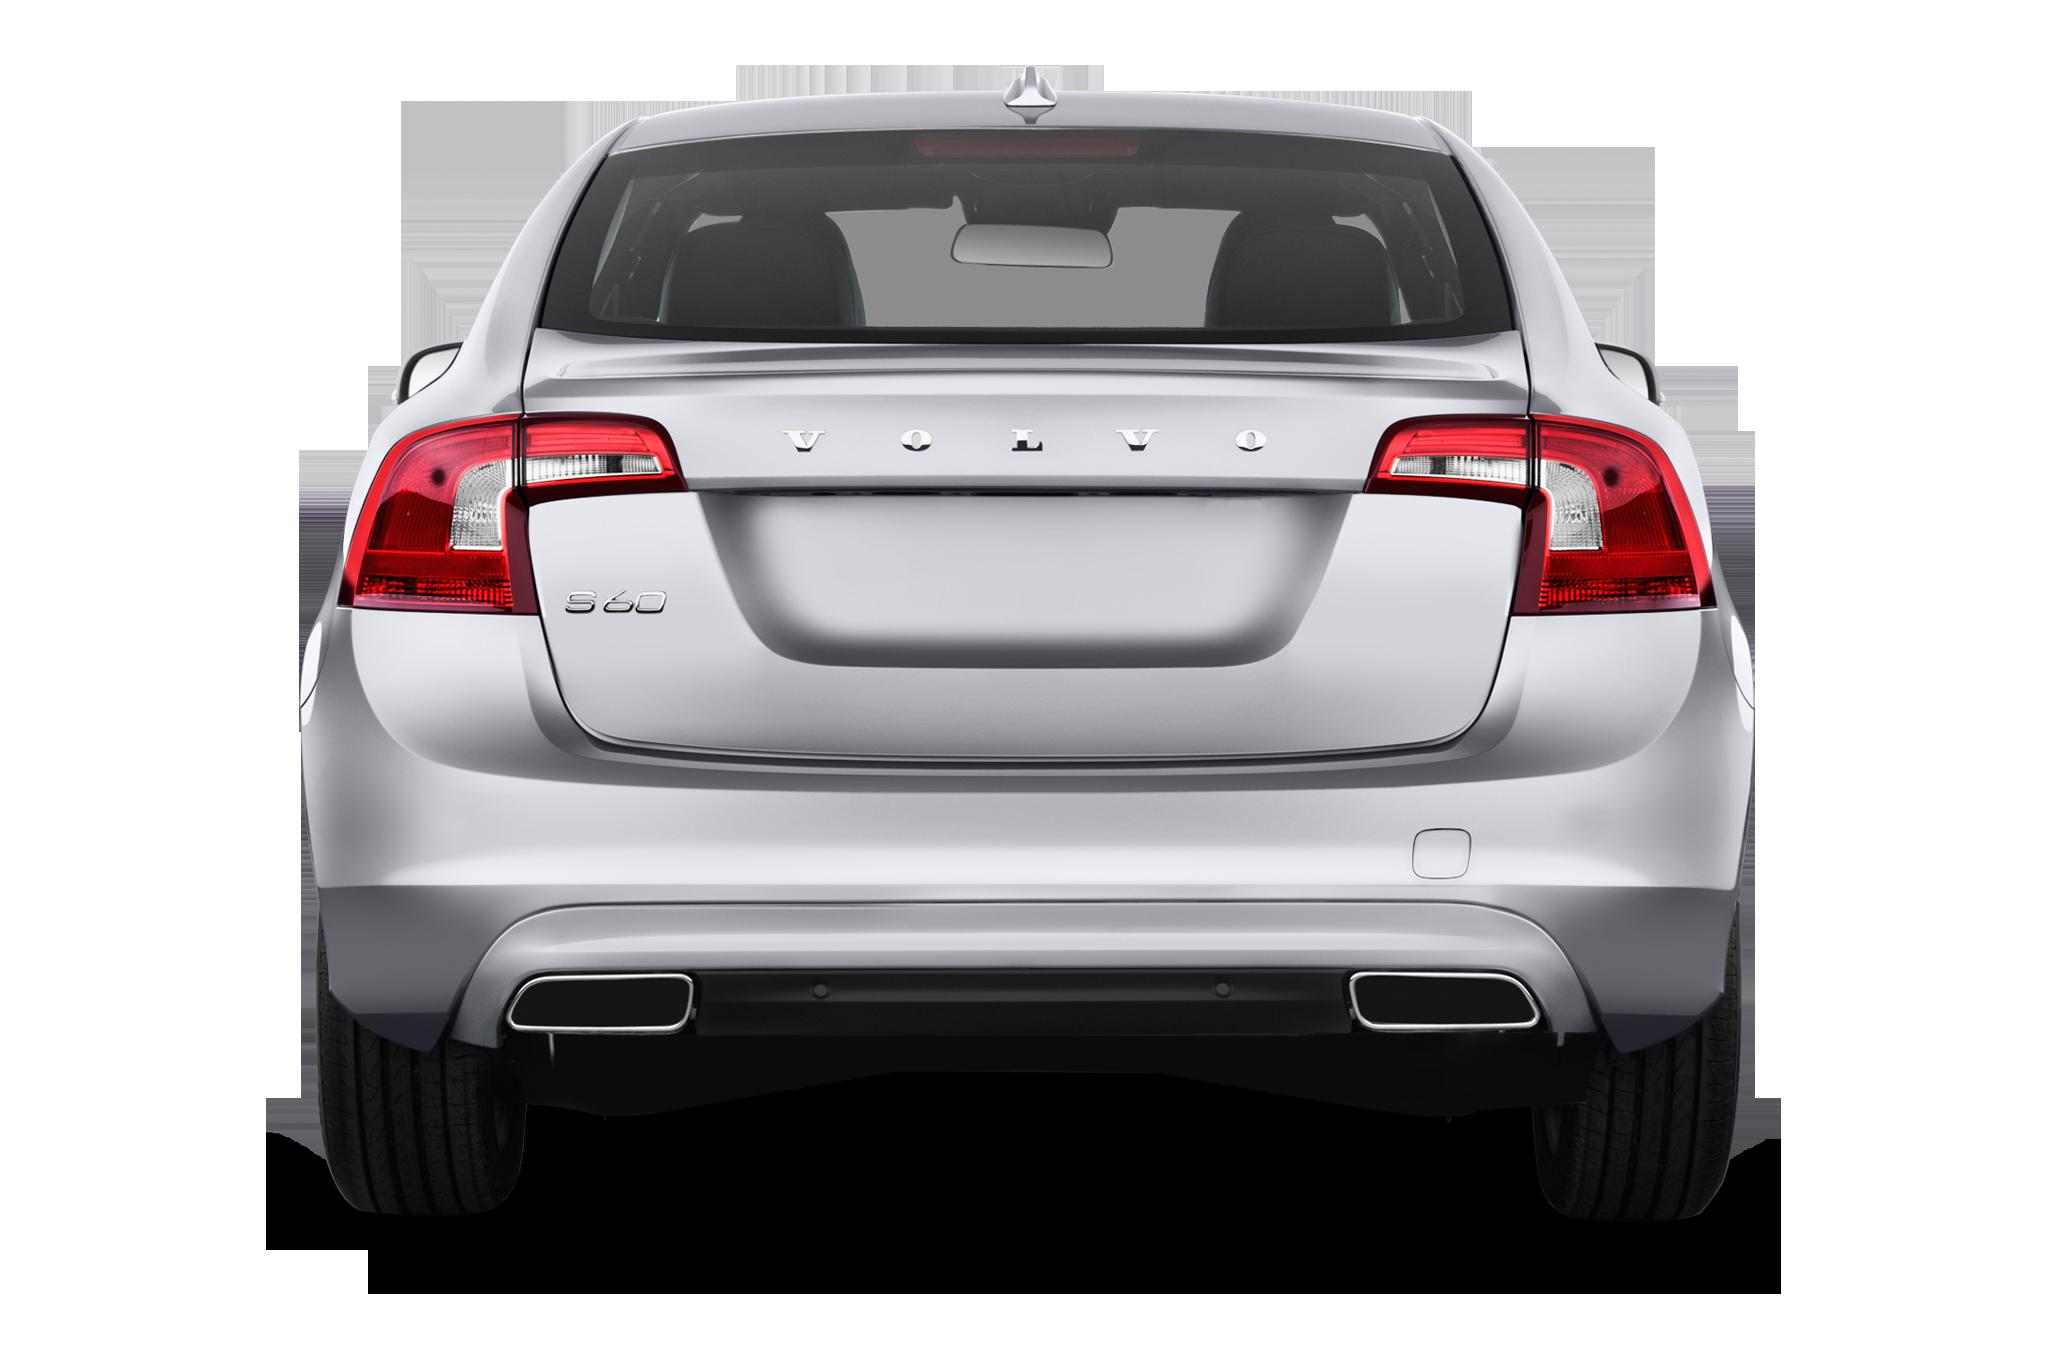 265 More Volvo S60 V60 Polestar Models Headed To The Us For 2016 Infiniti G37 Back Bumper 17 29